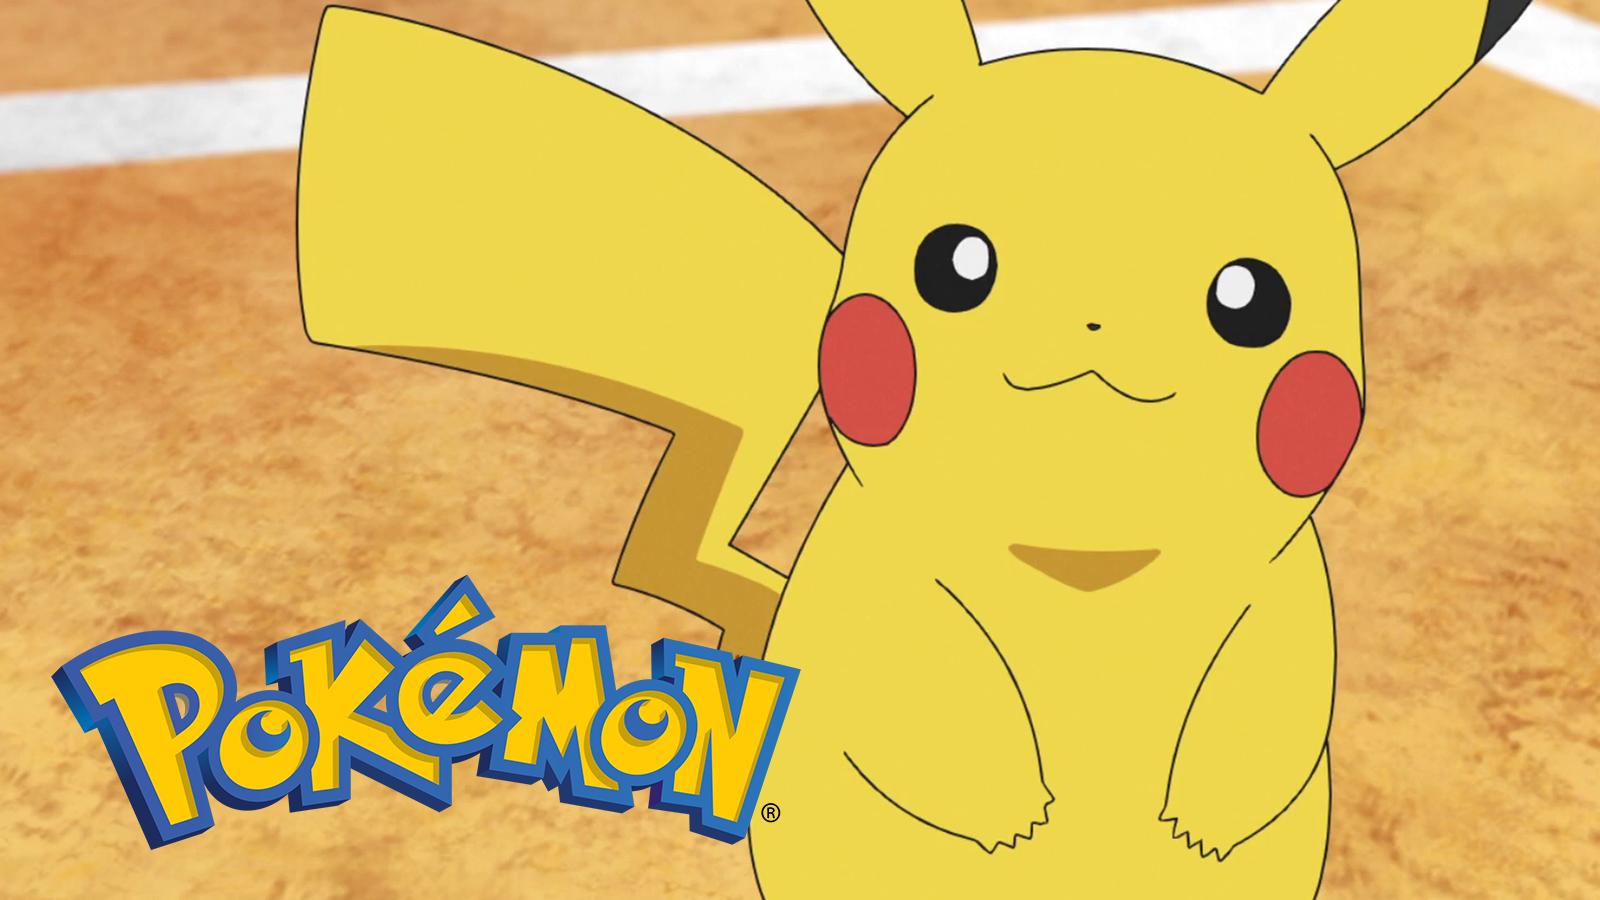 Pikachu best Electric Pokemon full list.